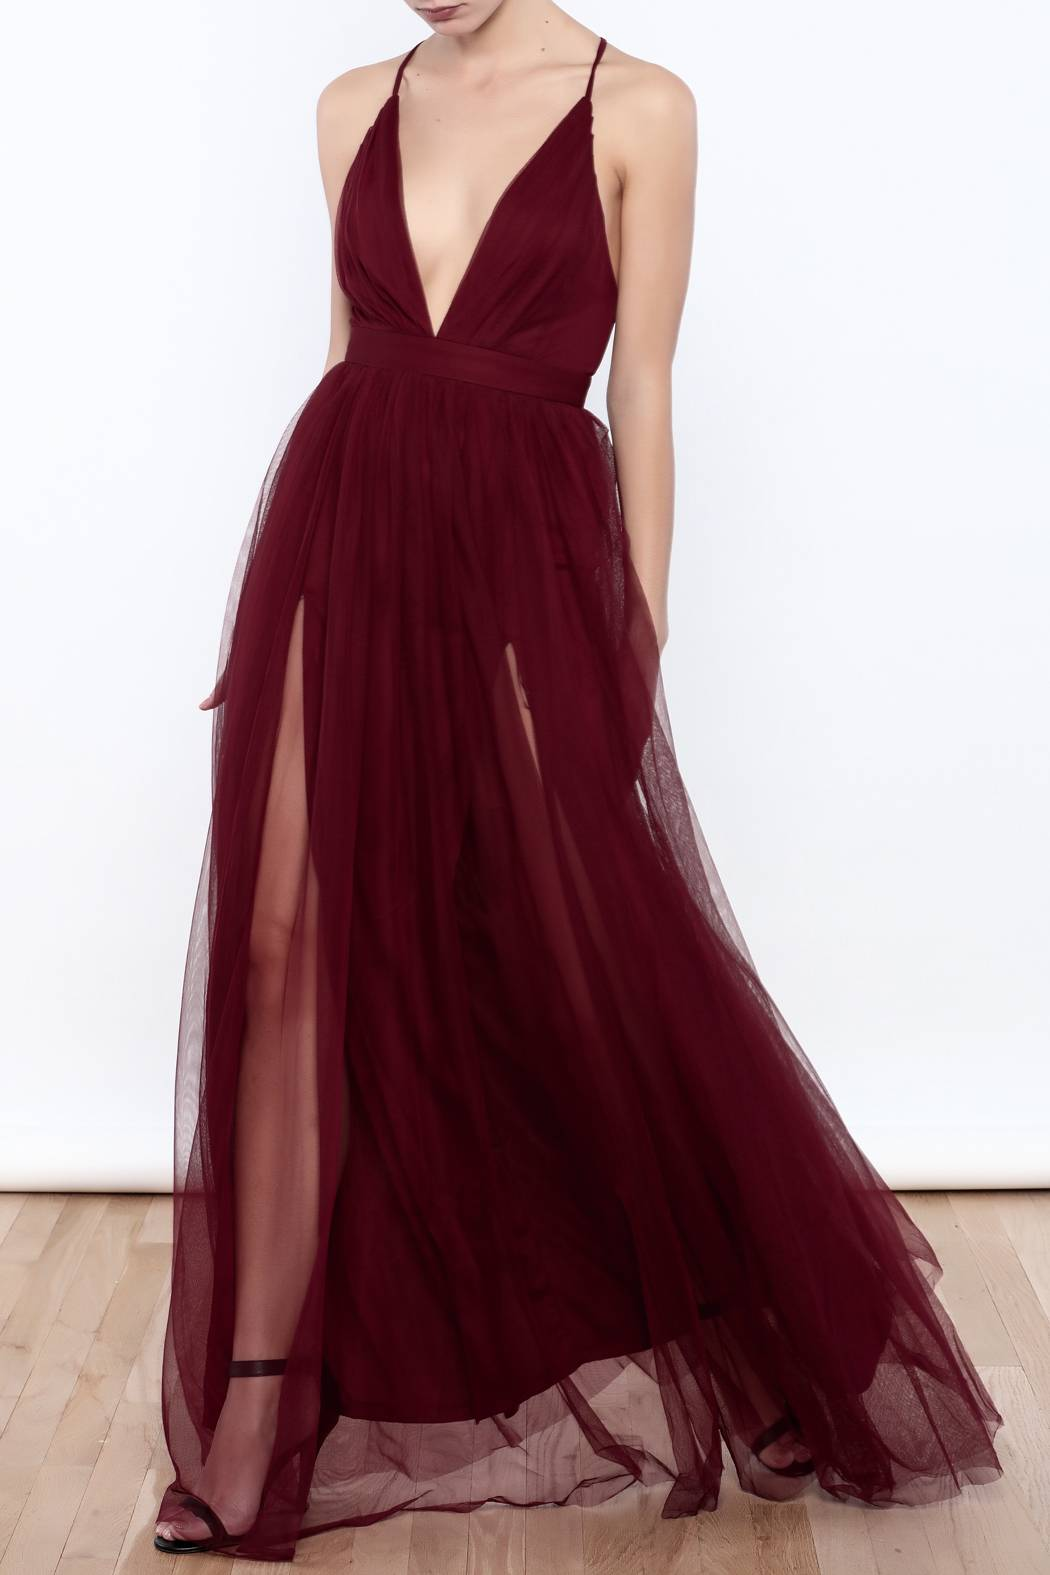 Prom Dress, Prom Dresses 2017, Sexy Black Prom Dresses ...